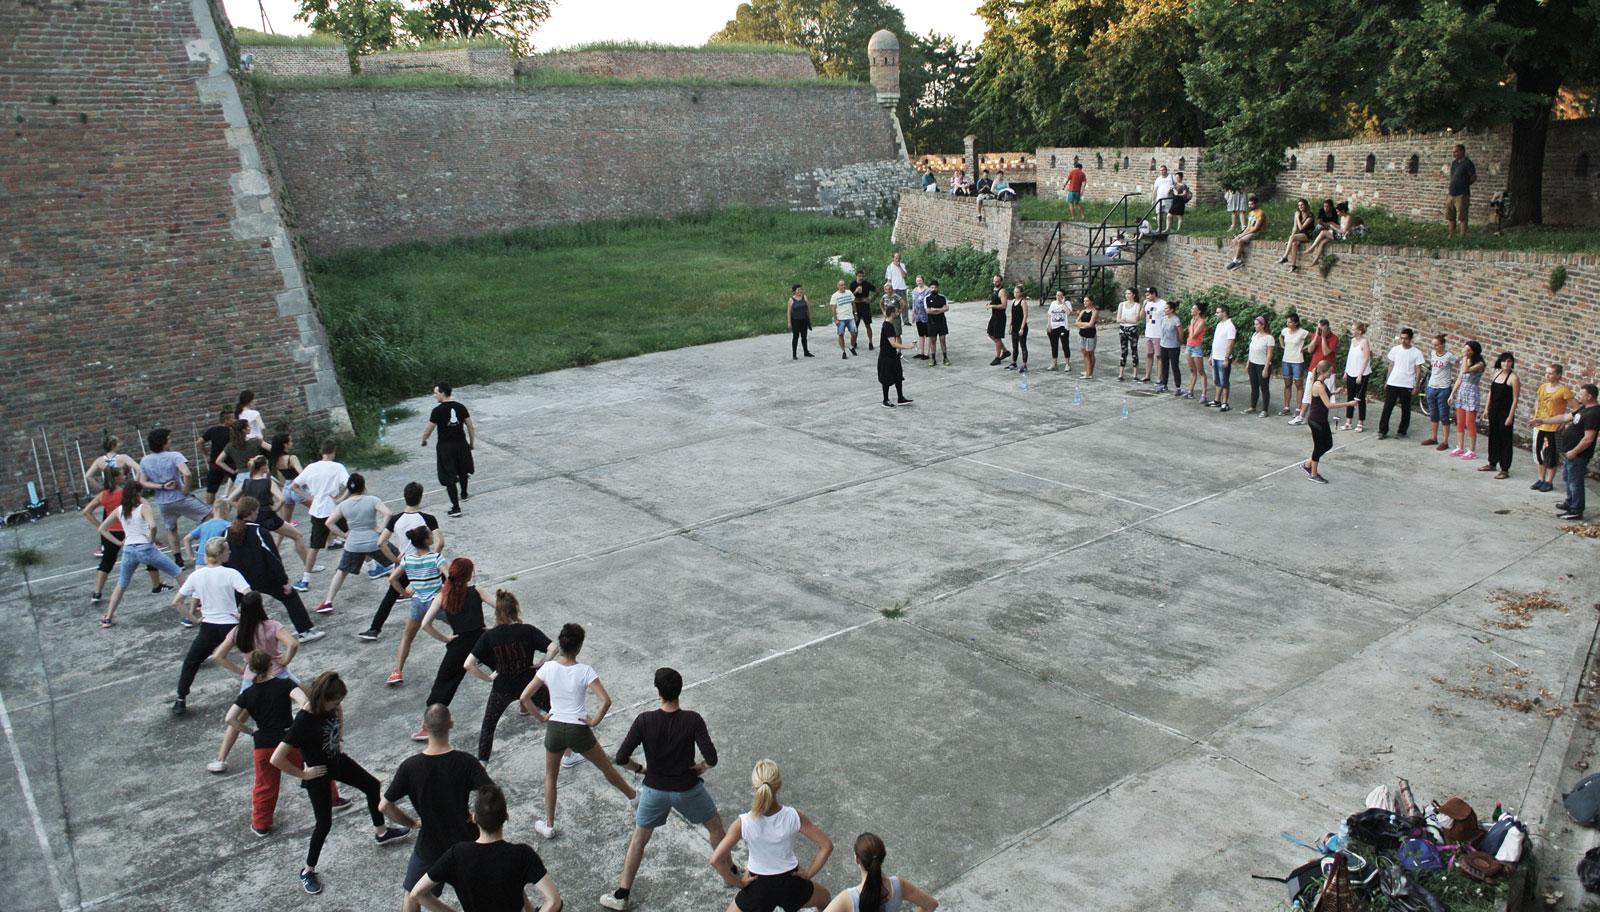 Macevanje u beogradu - Skola macevanja P